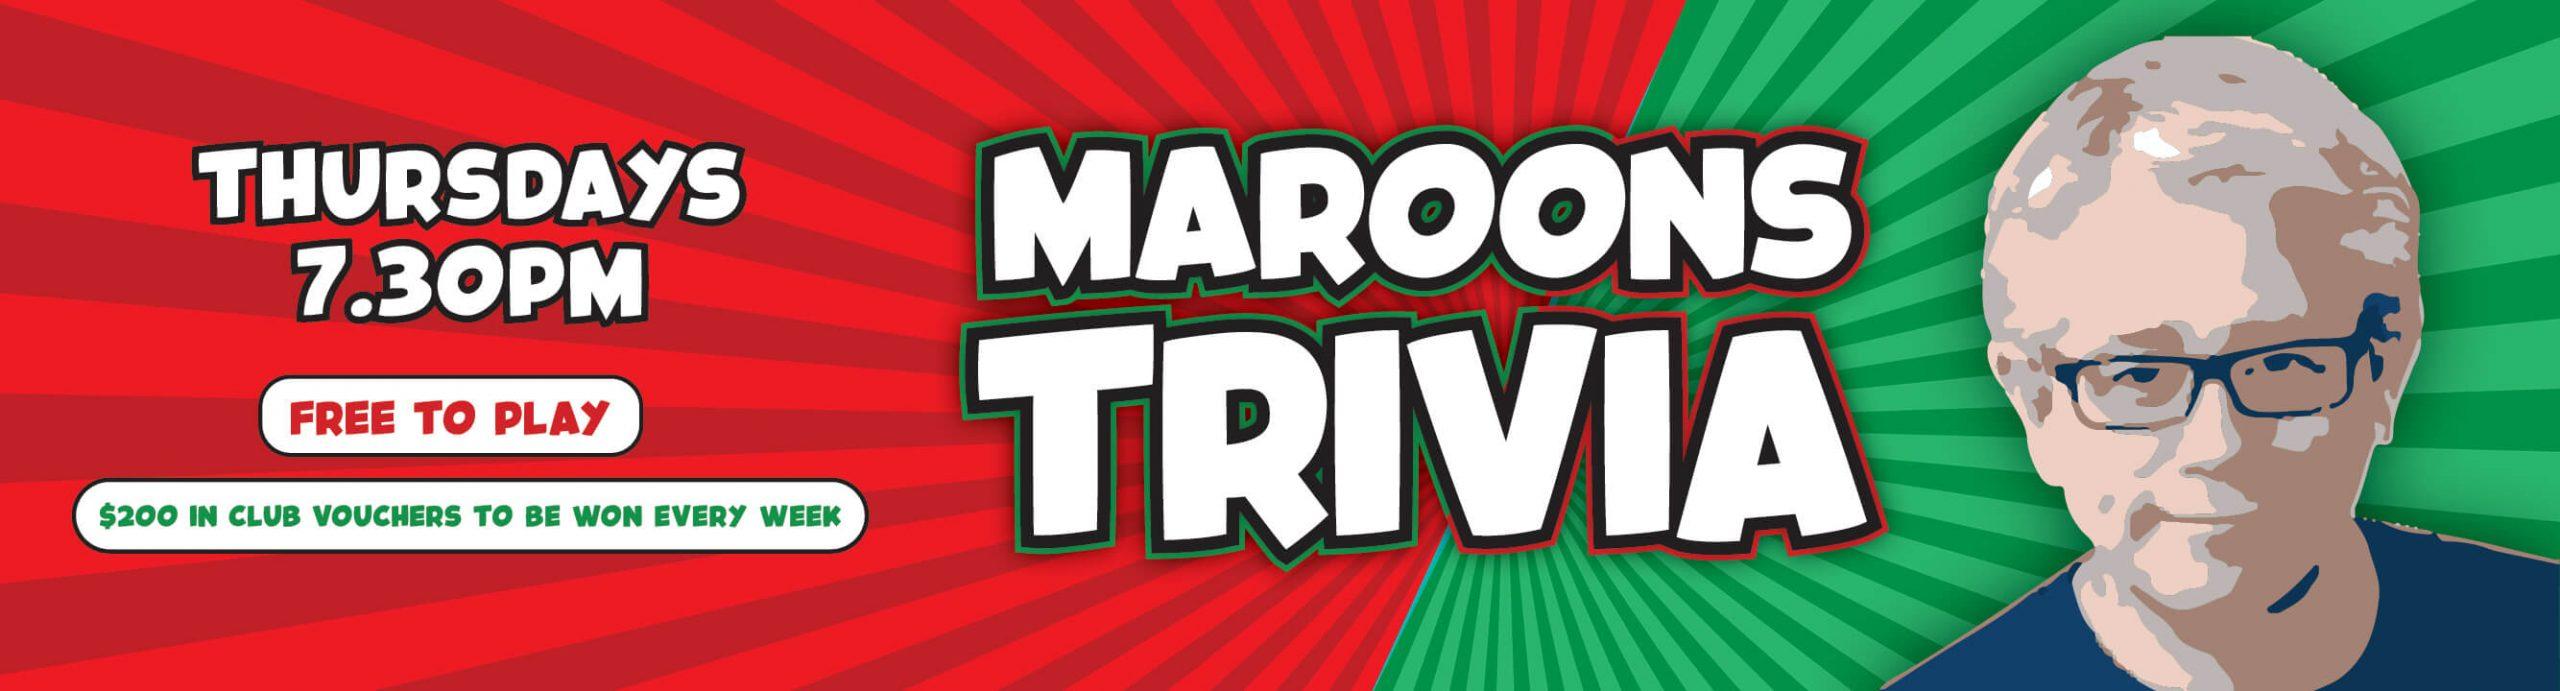 maroons trivia